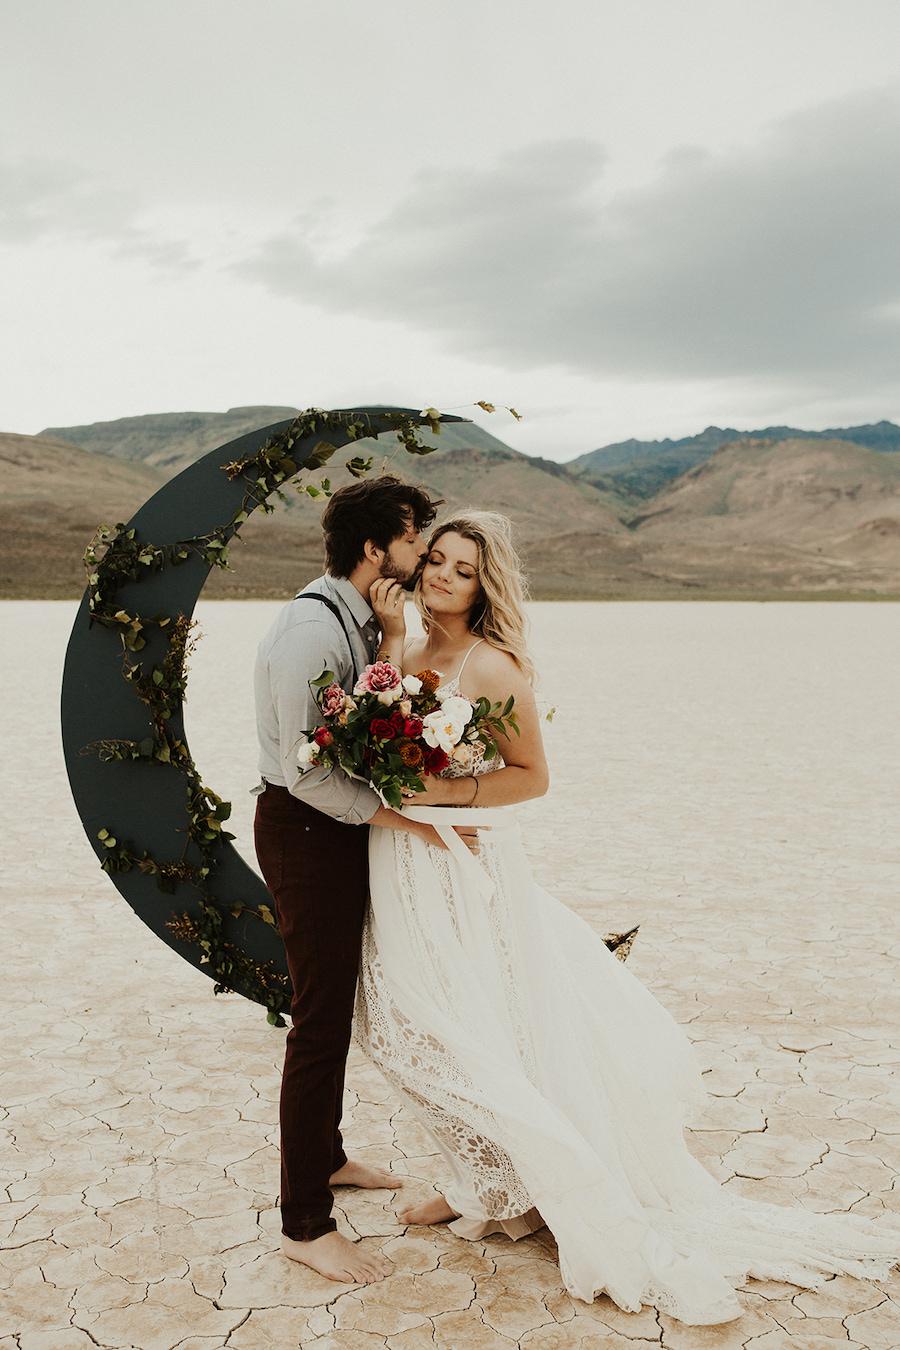 matrimonio a tema luna e stelle